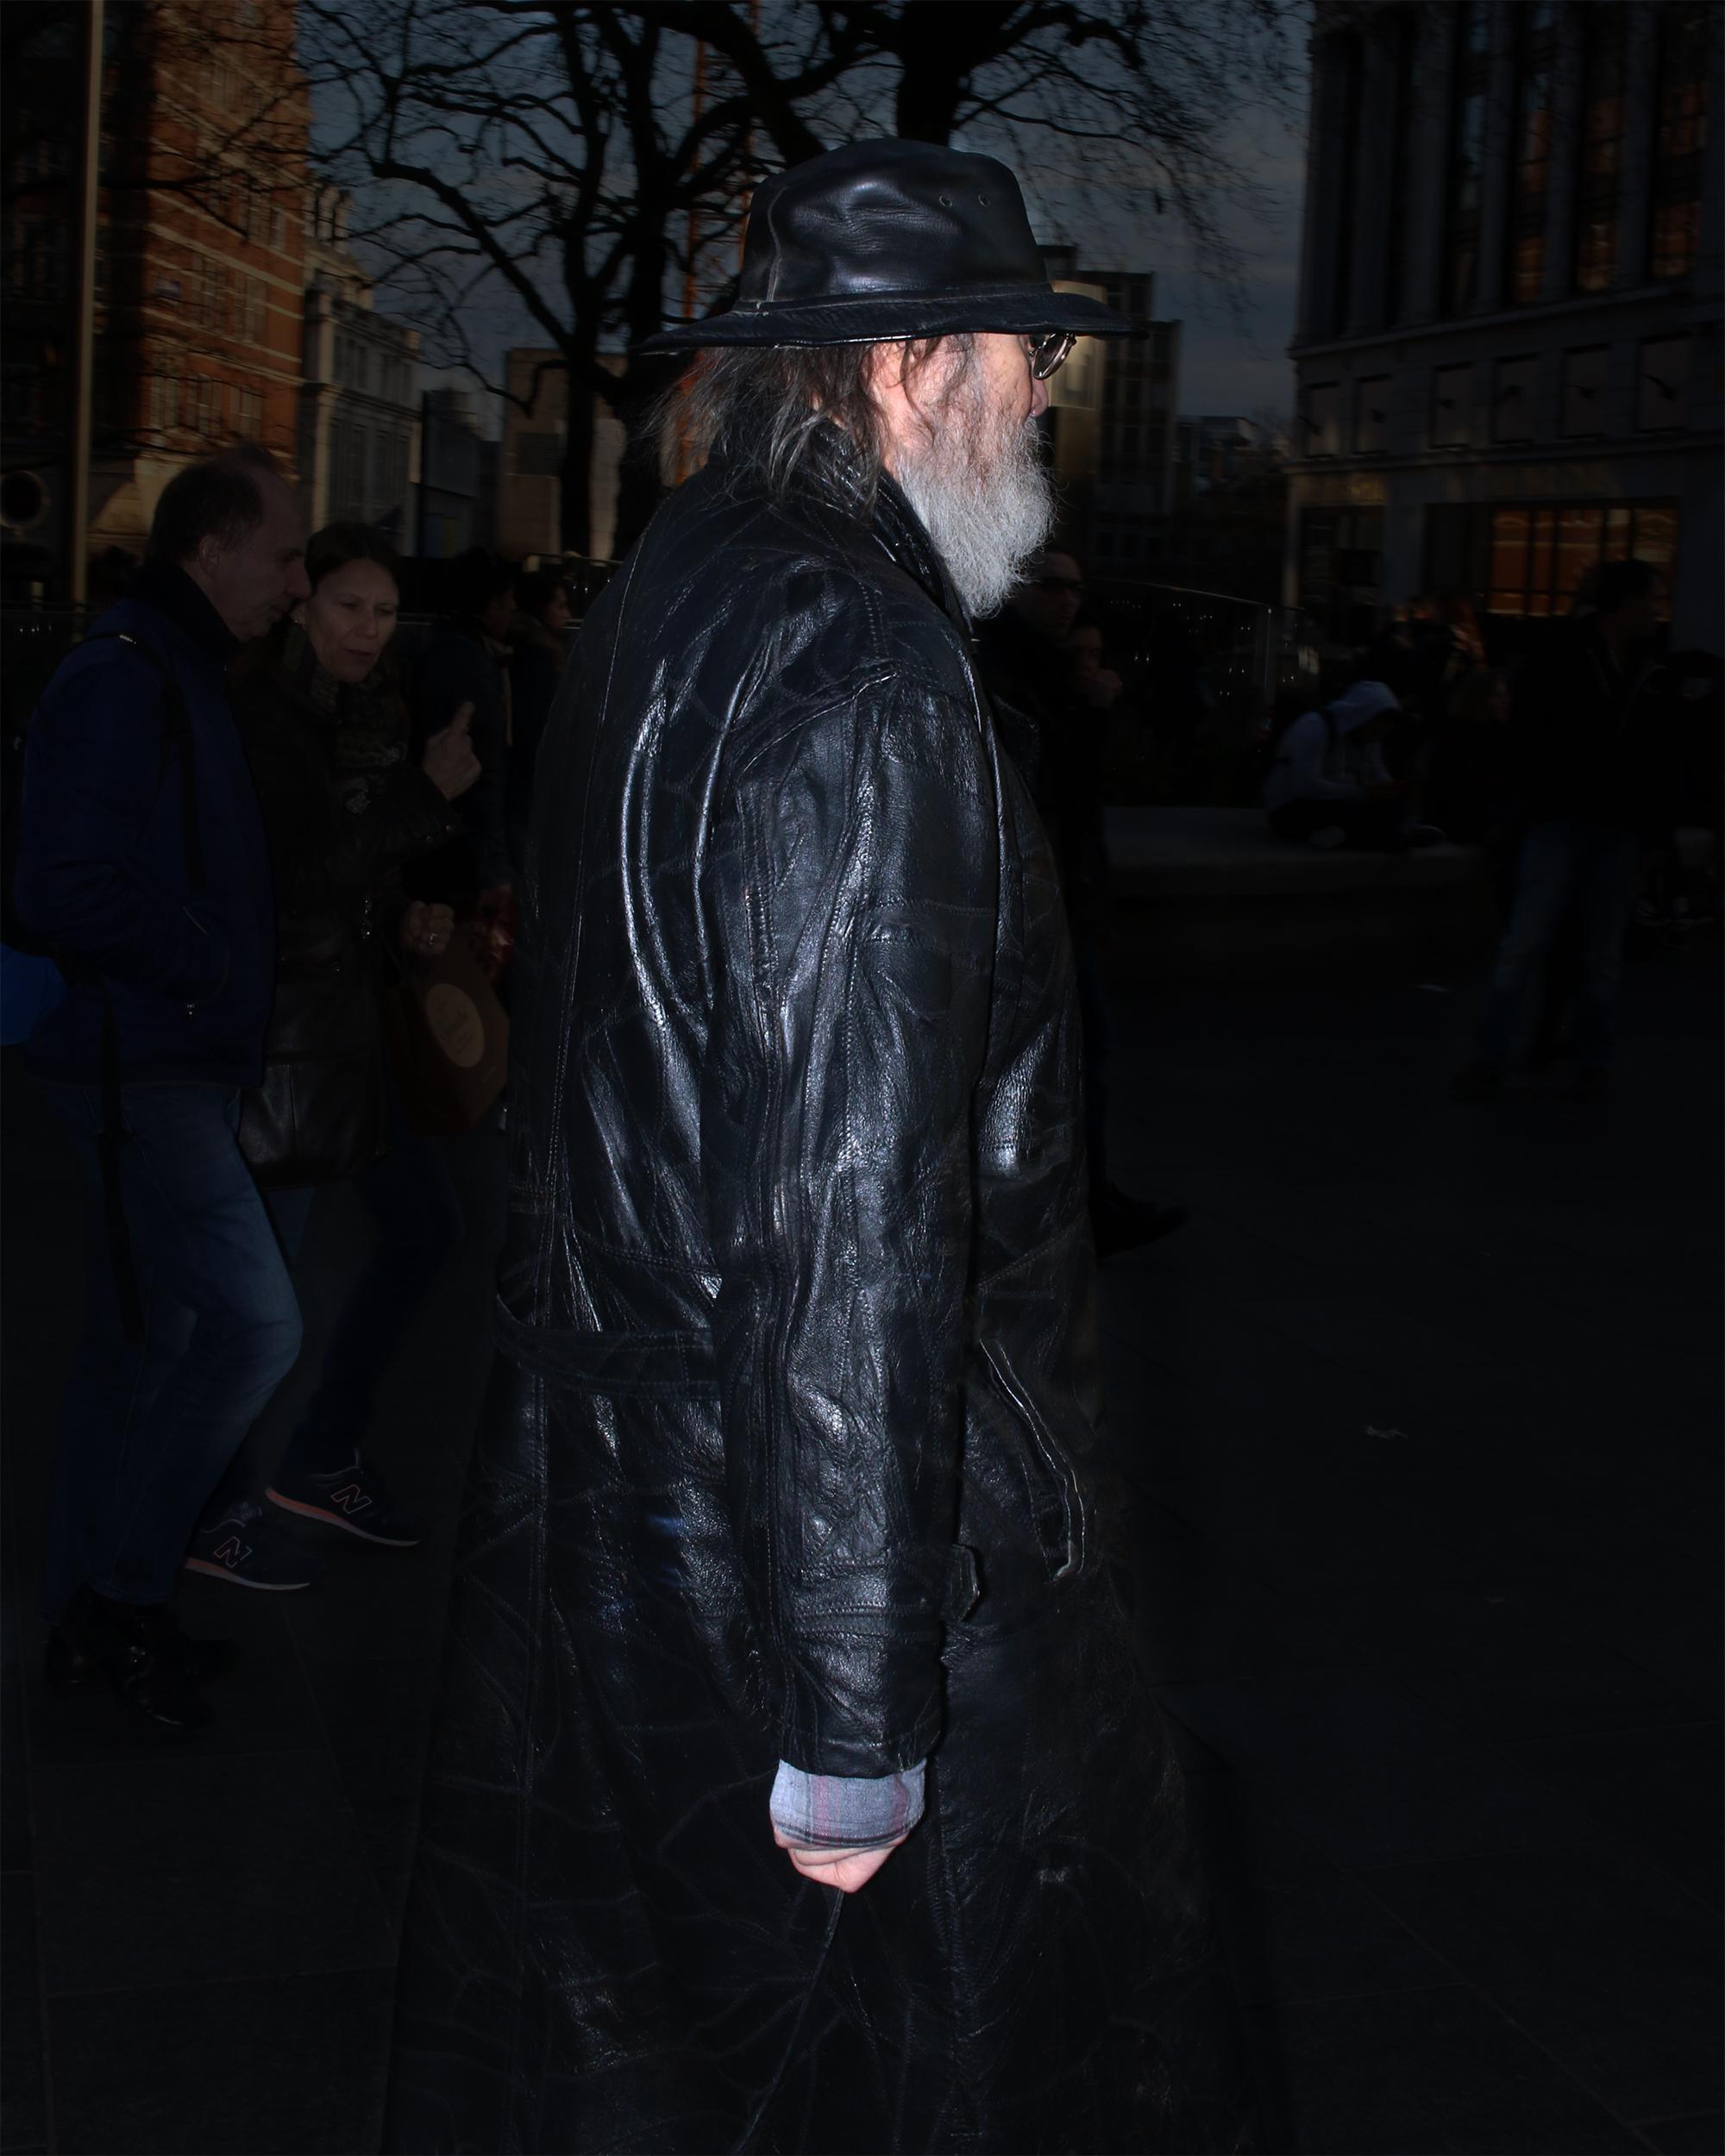 trench coat man.jpg